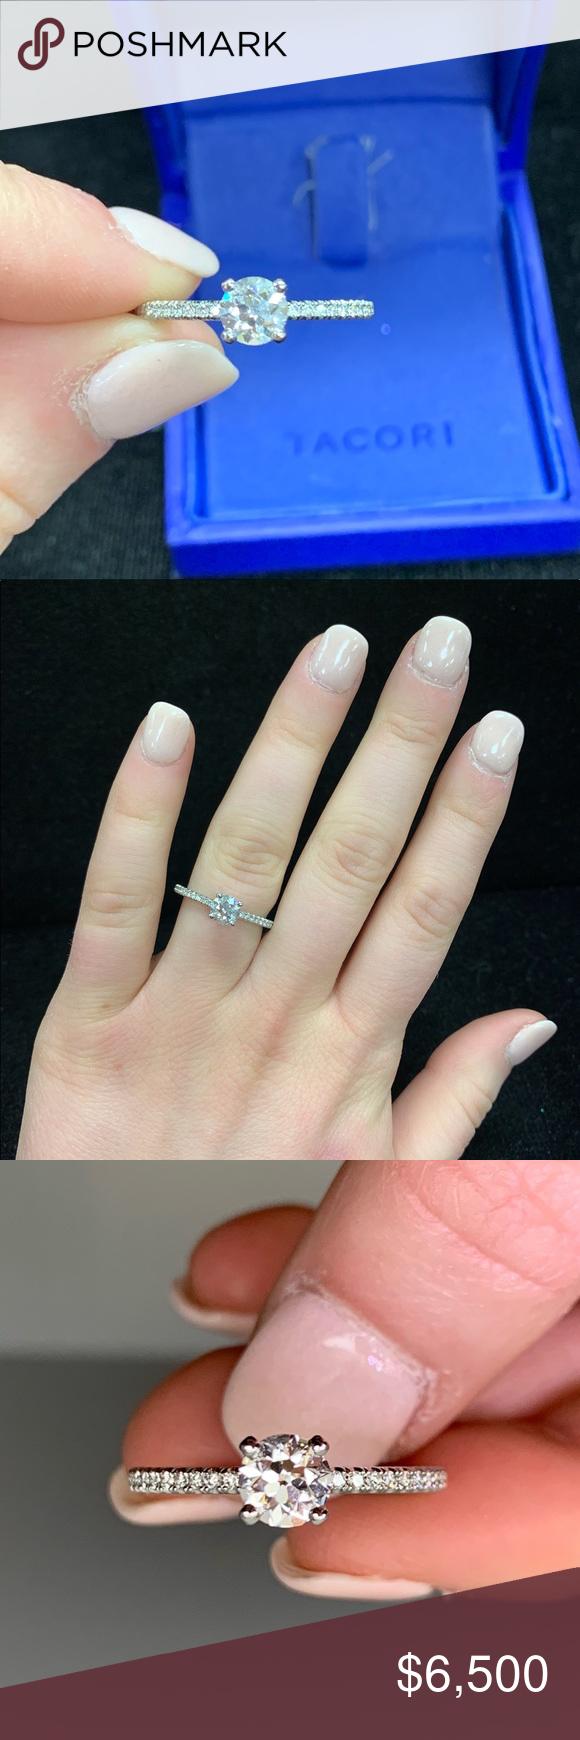 Tacori Engagement Ring In 2020 Tacori Engagement Rings Engagement Rings Tacori Jewelry